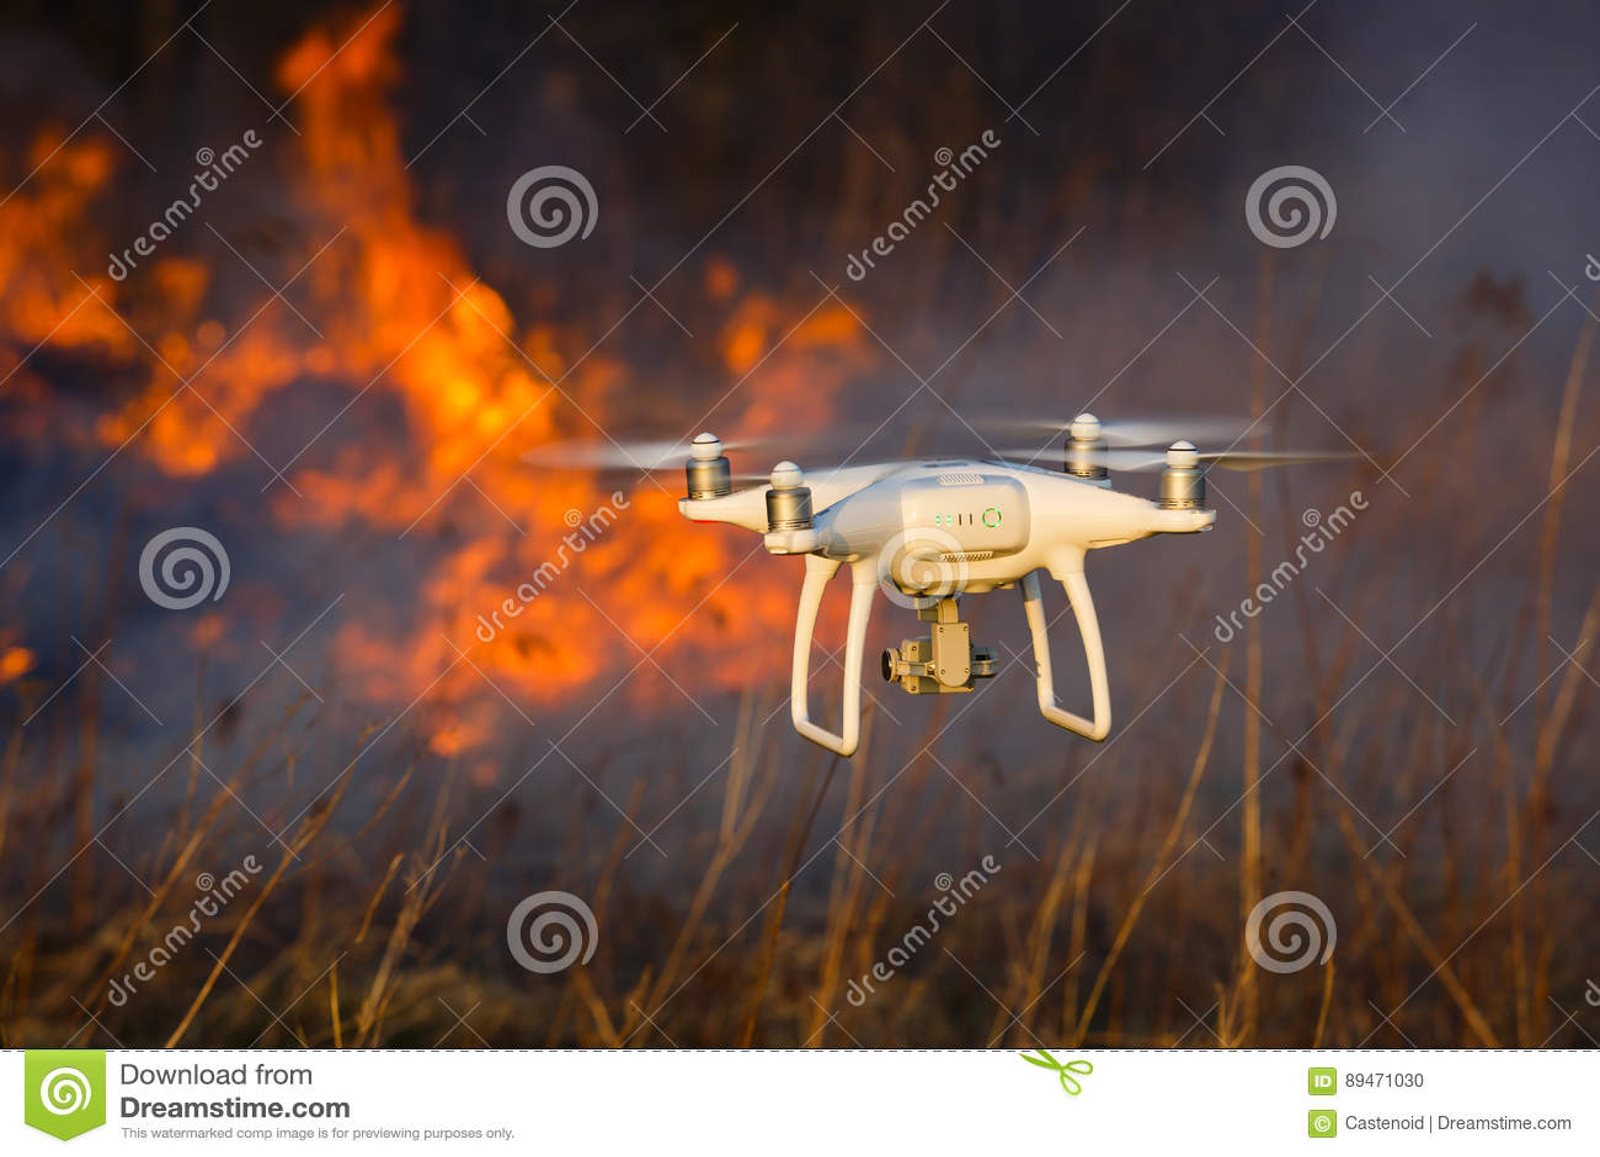 Flying drone in a fire